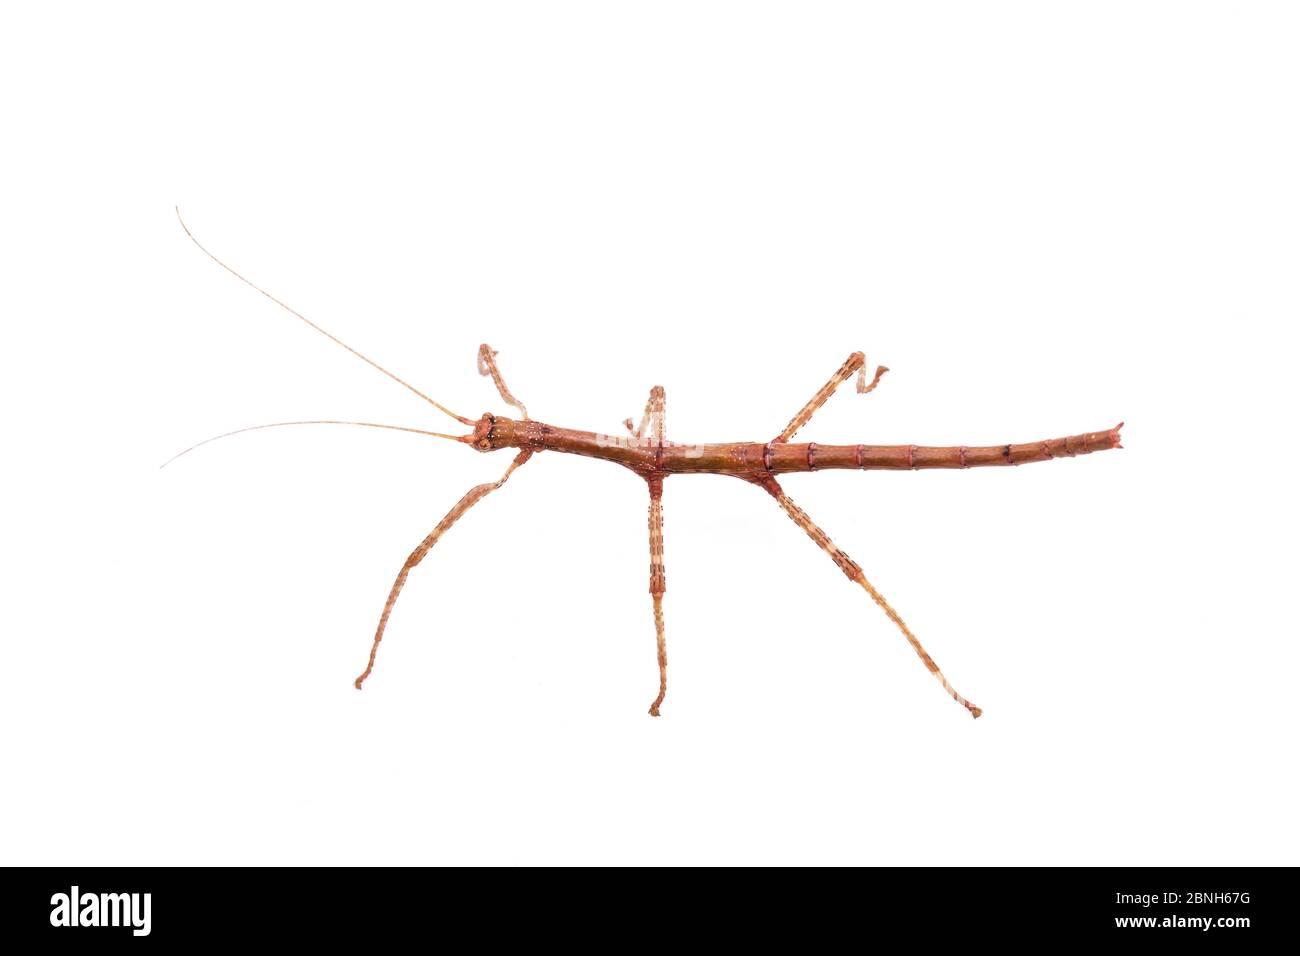 Giant walking stick (Megaphasma dentricus) nymph, captive laboratory animal. Stock Photo